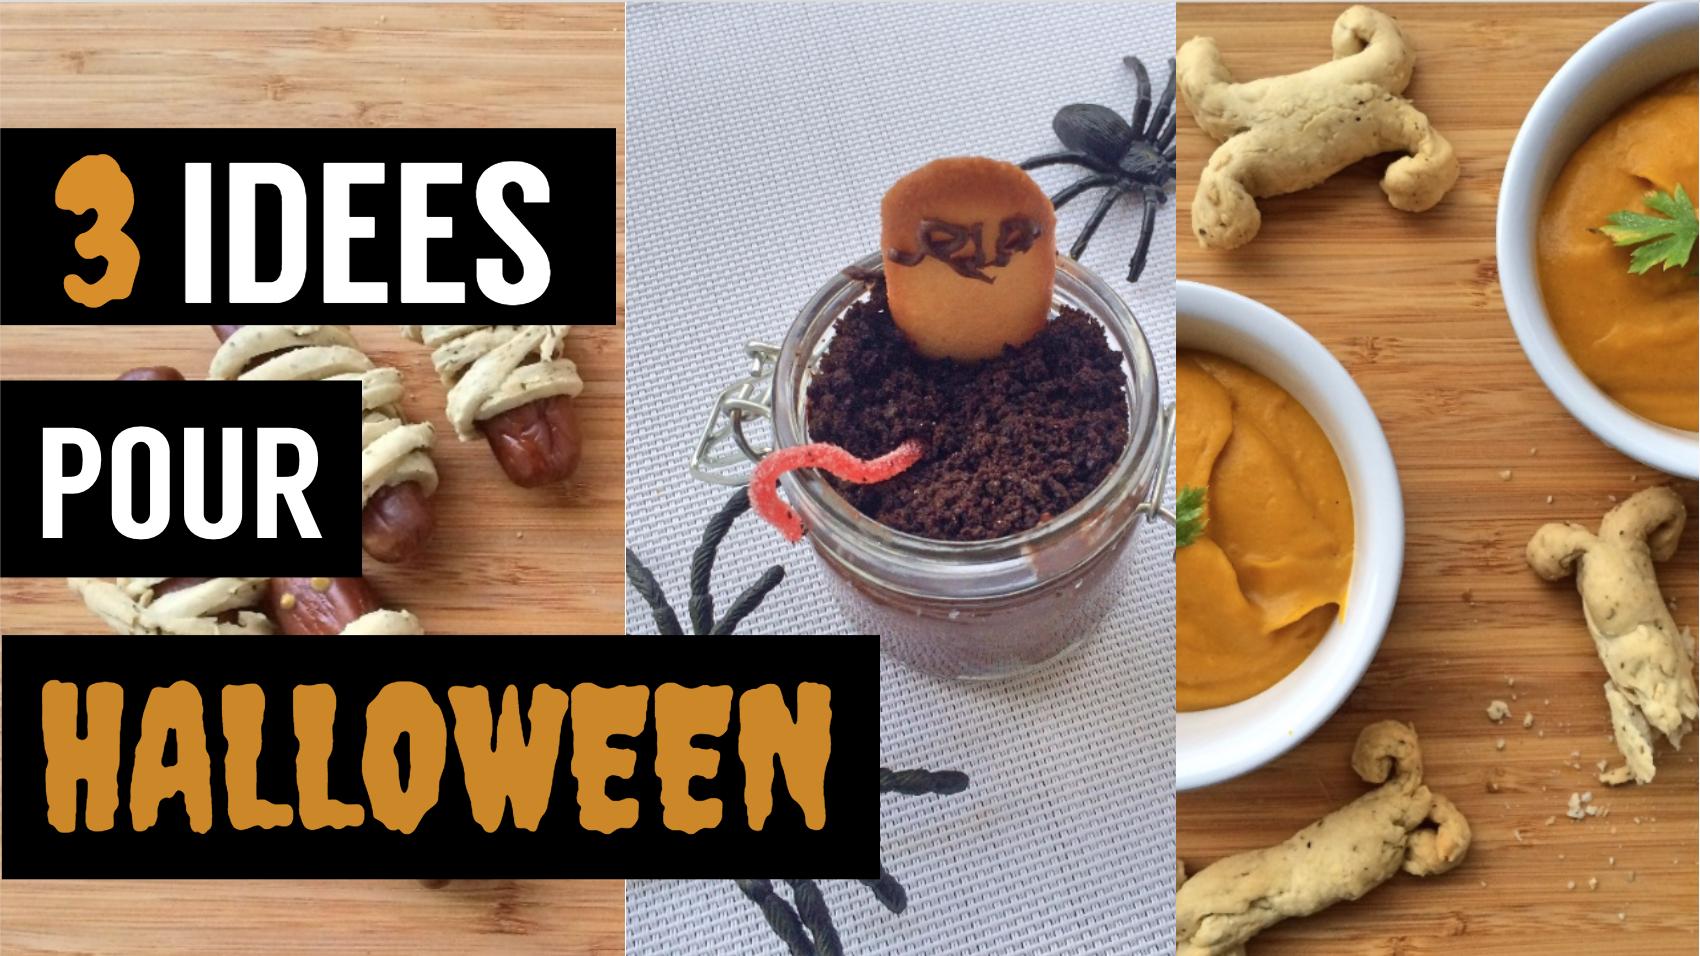 halloween - recettes végétariennes et vegan - atirelarigot